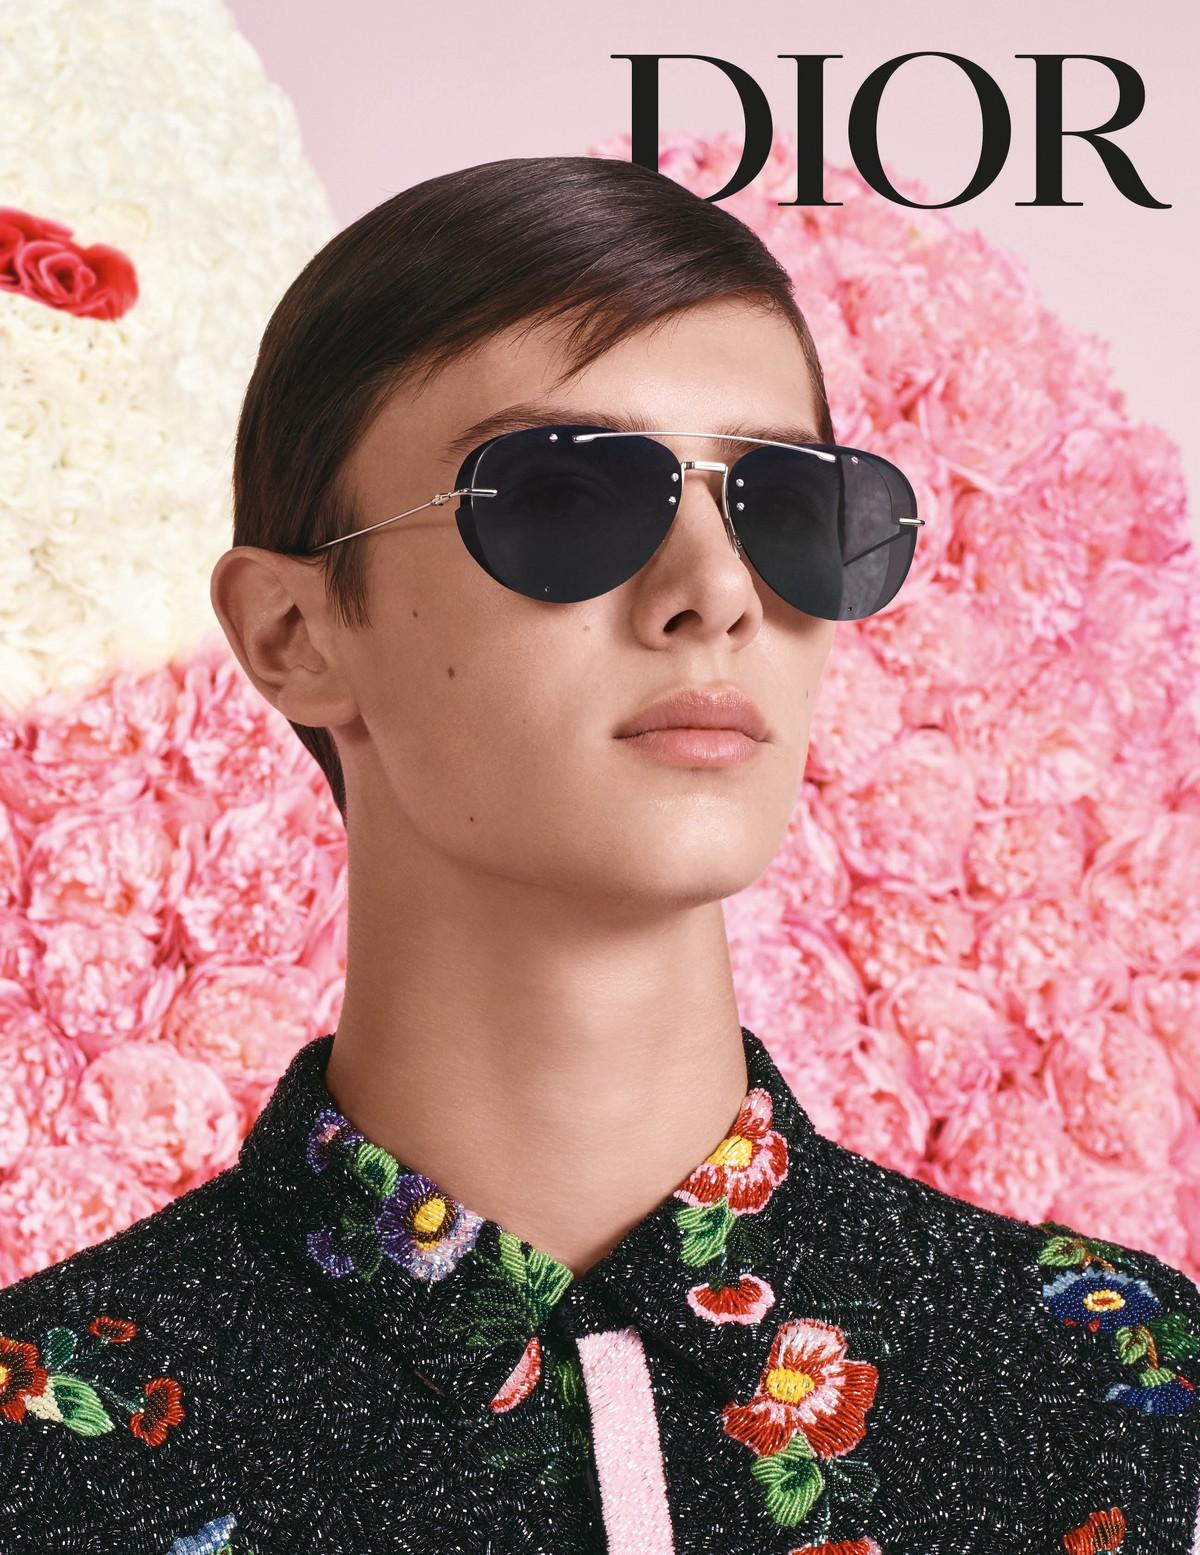 Dior Homme campagna estate 2019